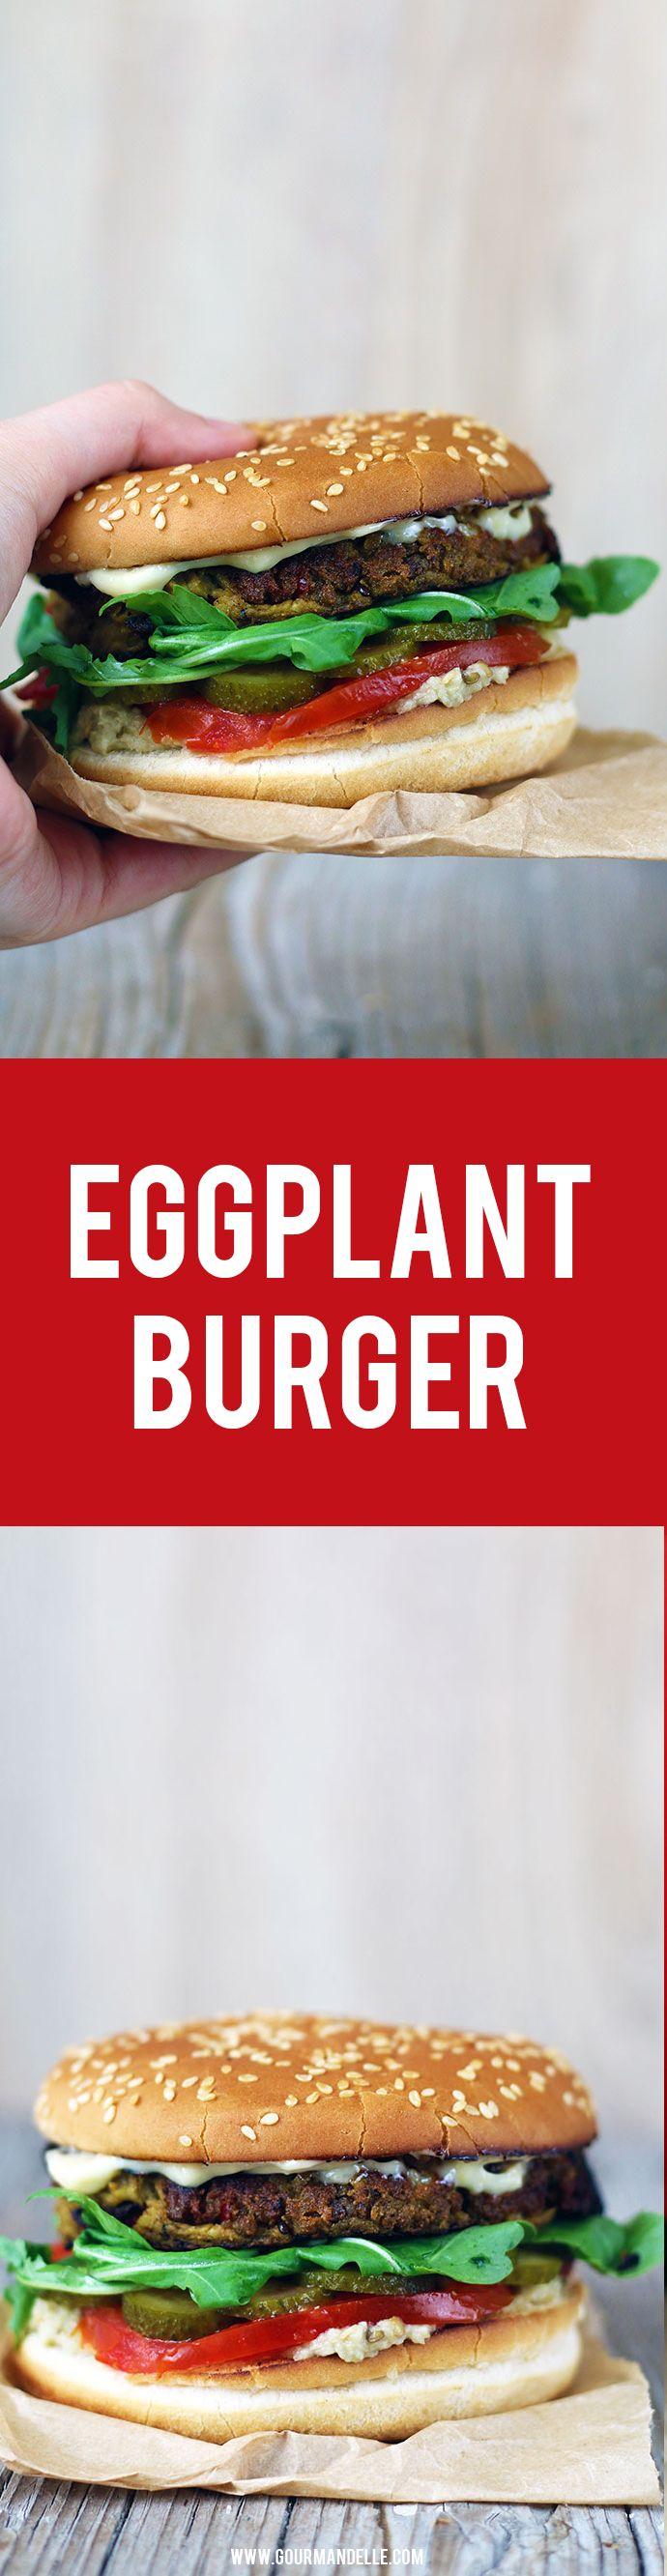 You'll love this eggplant burger recipe! This vegan eggplant burger recipe is extremely easy to make, has a subtle garlic taste and strong za'atar flavor. #eggplant #veganburger #burger https://gourmandelle.com/eggplant-burger/